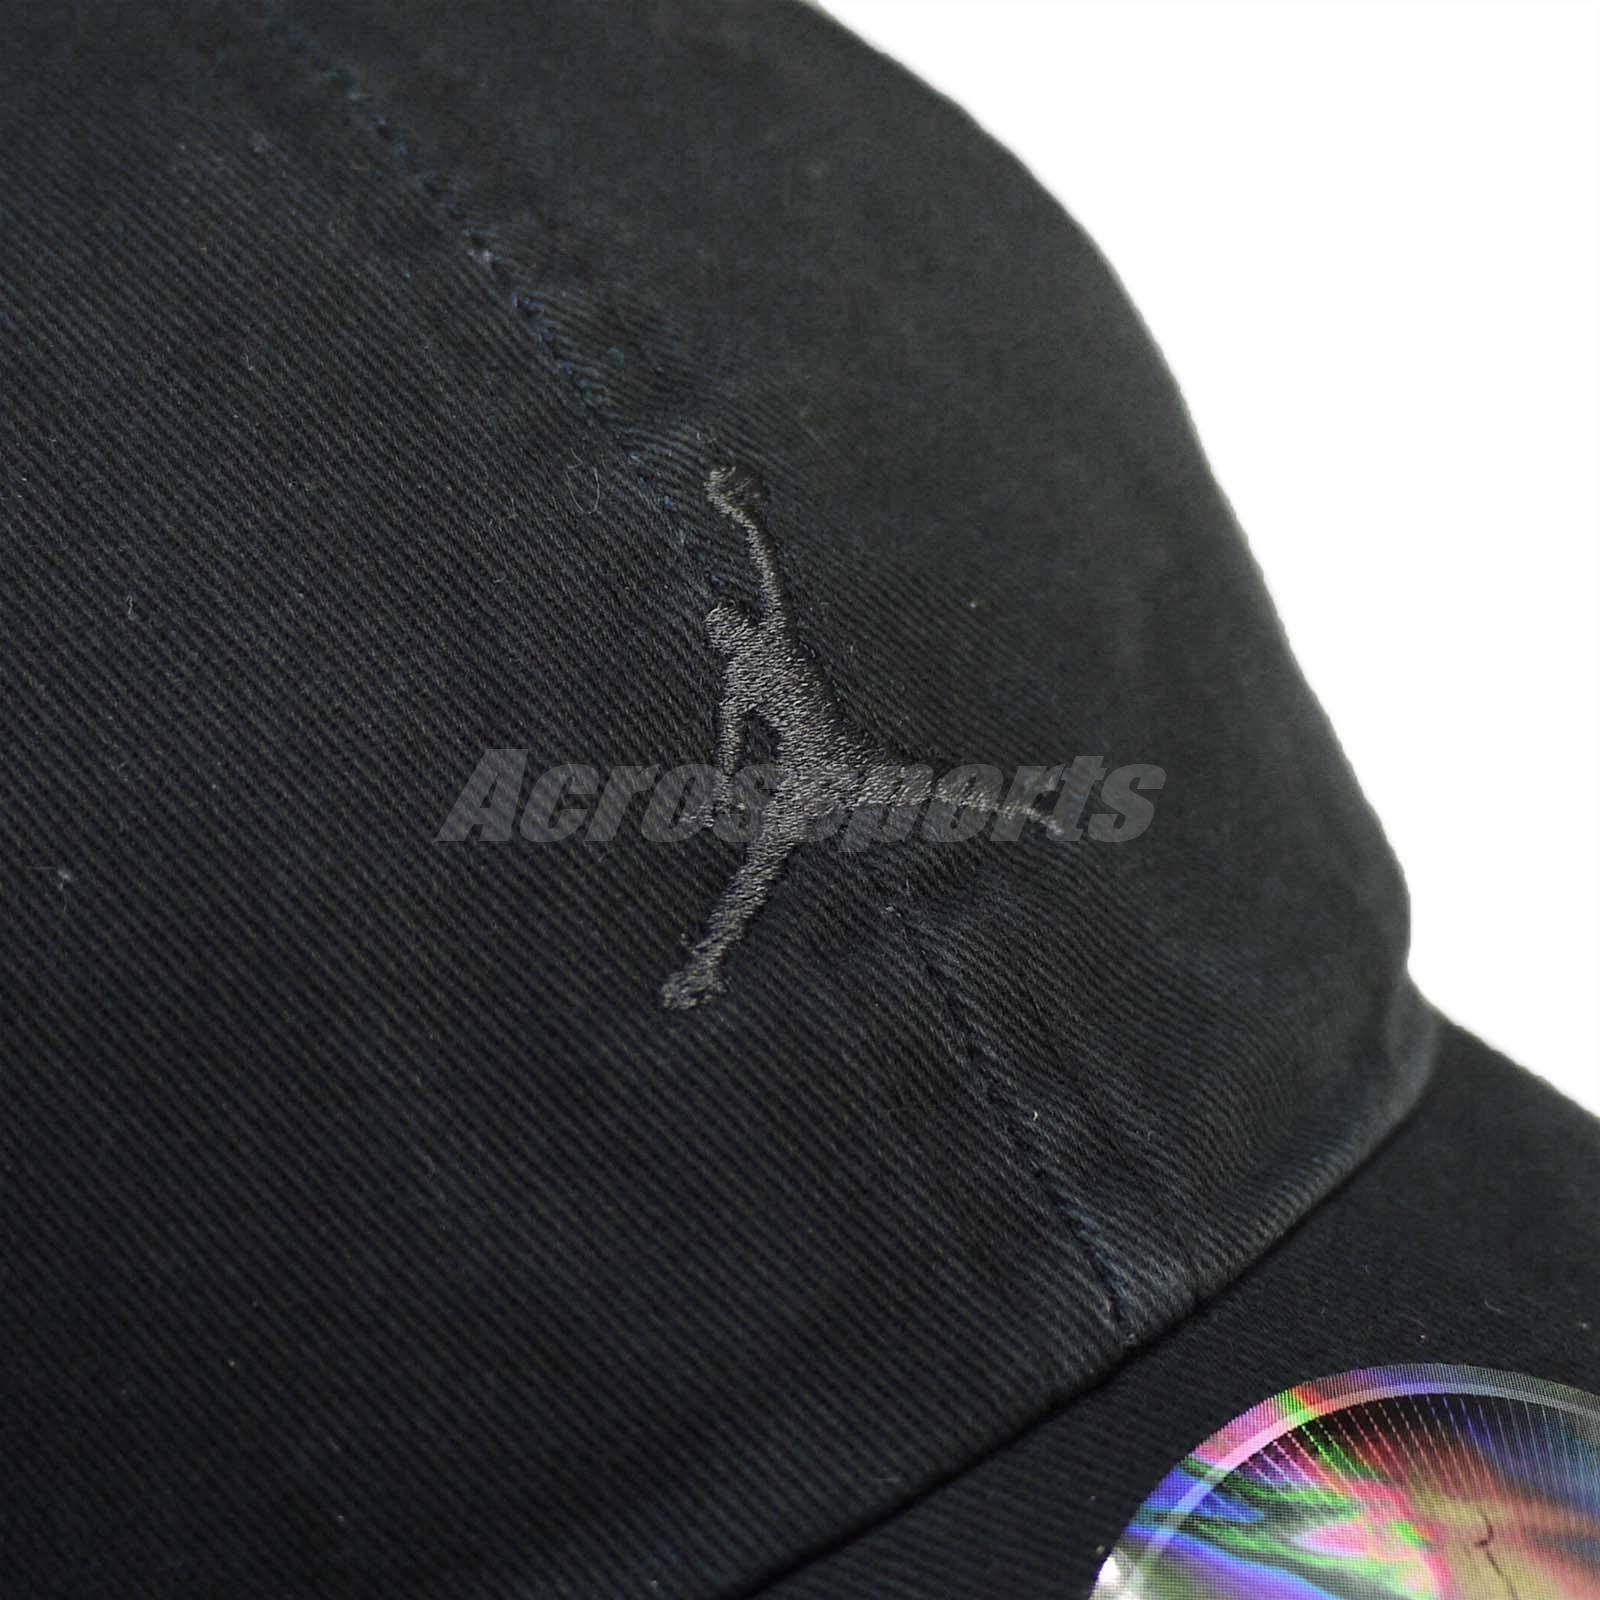 83a68a7520916 Details about Nike Unisex Jordan Heritage 86 Jumpman Floppy Cap Air Jumpman  Black AR2117-010